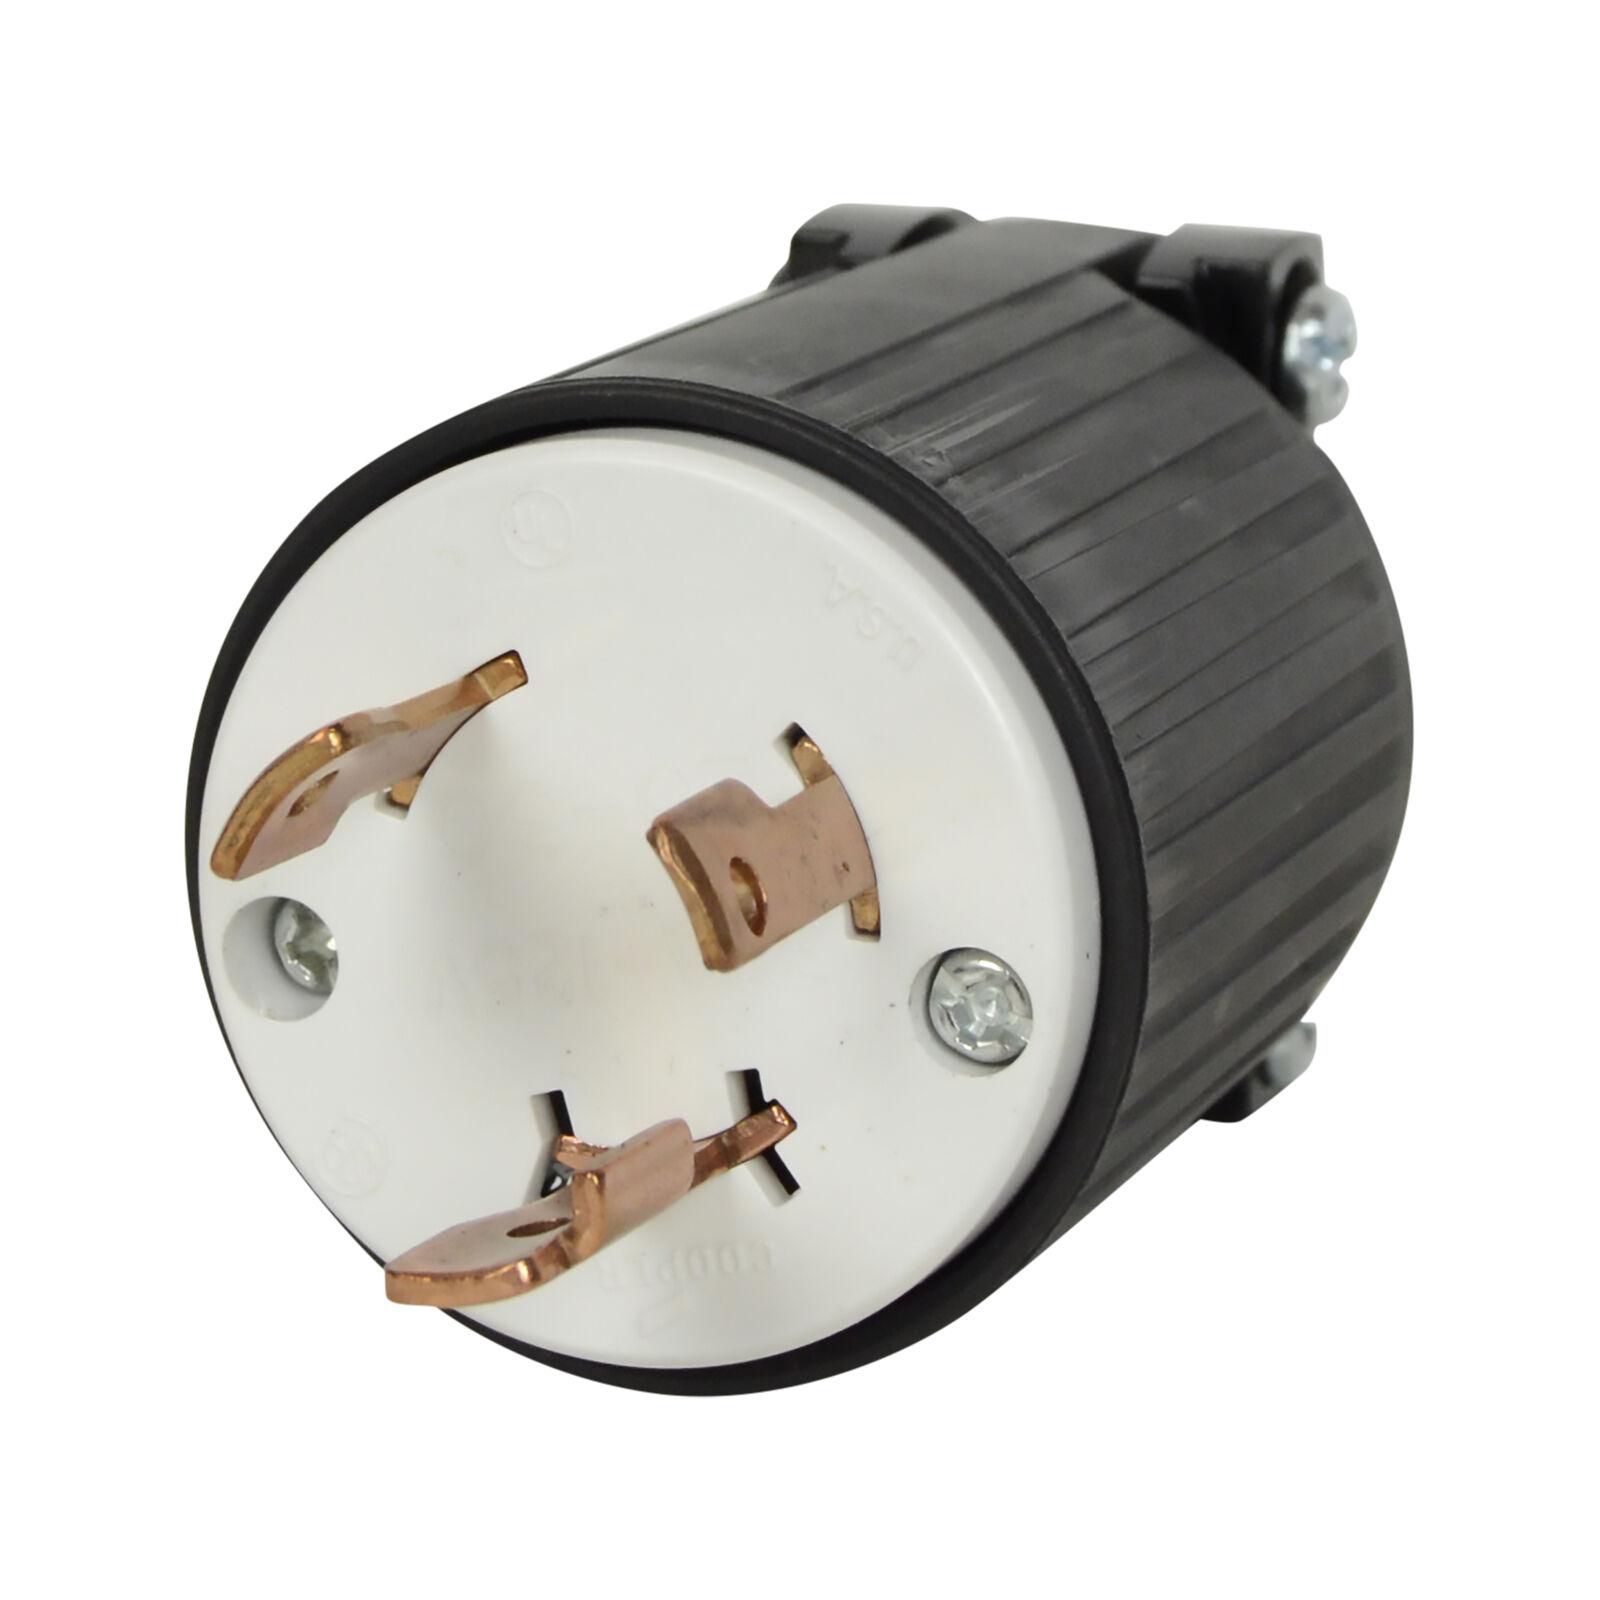 hight resolution of black l5 30p flanged power inlet generator rv plug 125 volt receptacle 30amp for sale online ebay